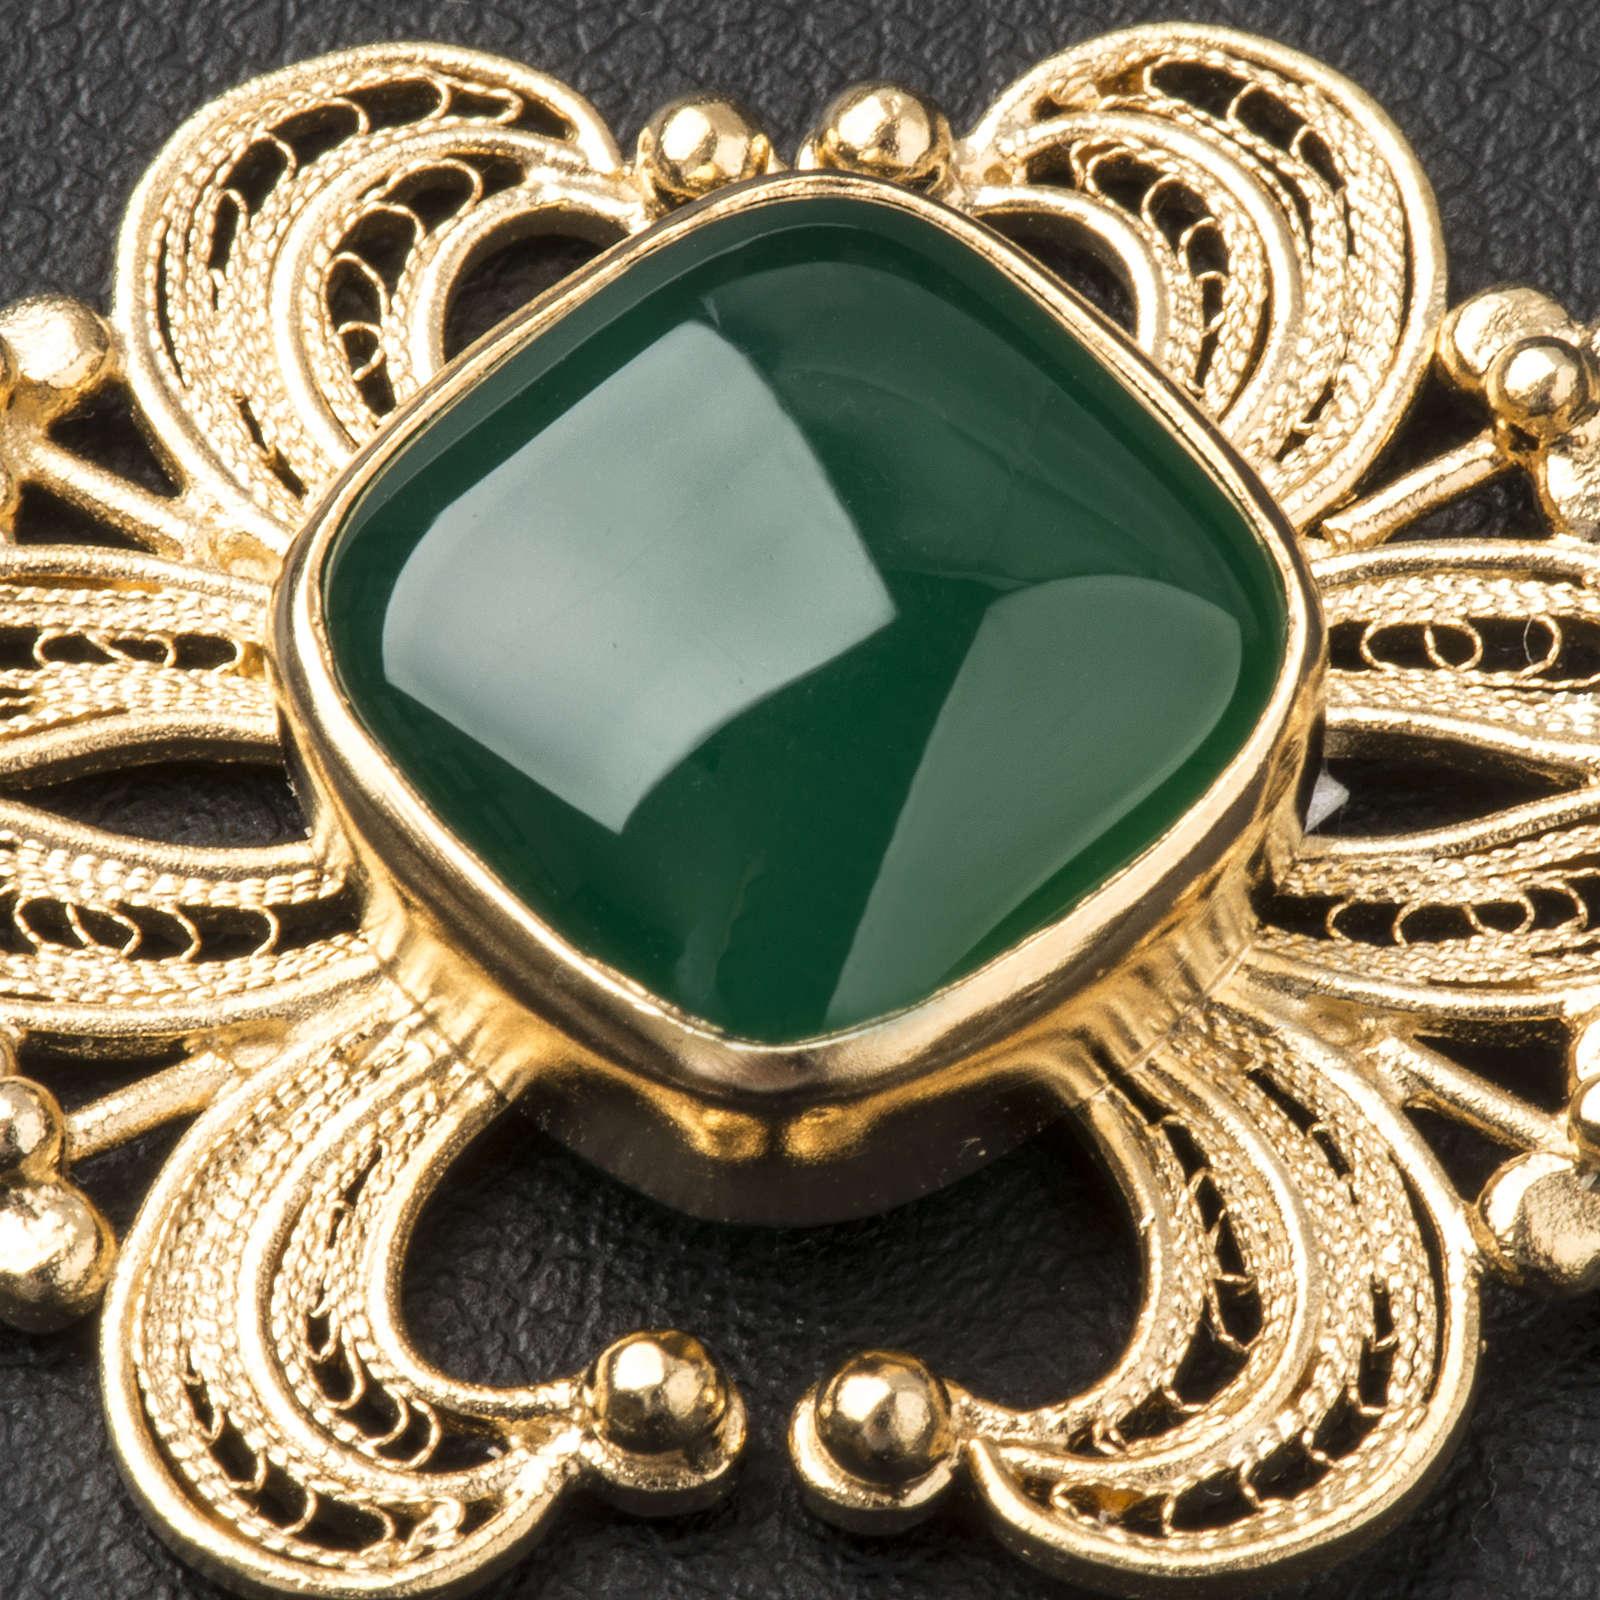 Almar para pluvial filigrana prata 800 dourada ágata verde 4